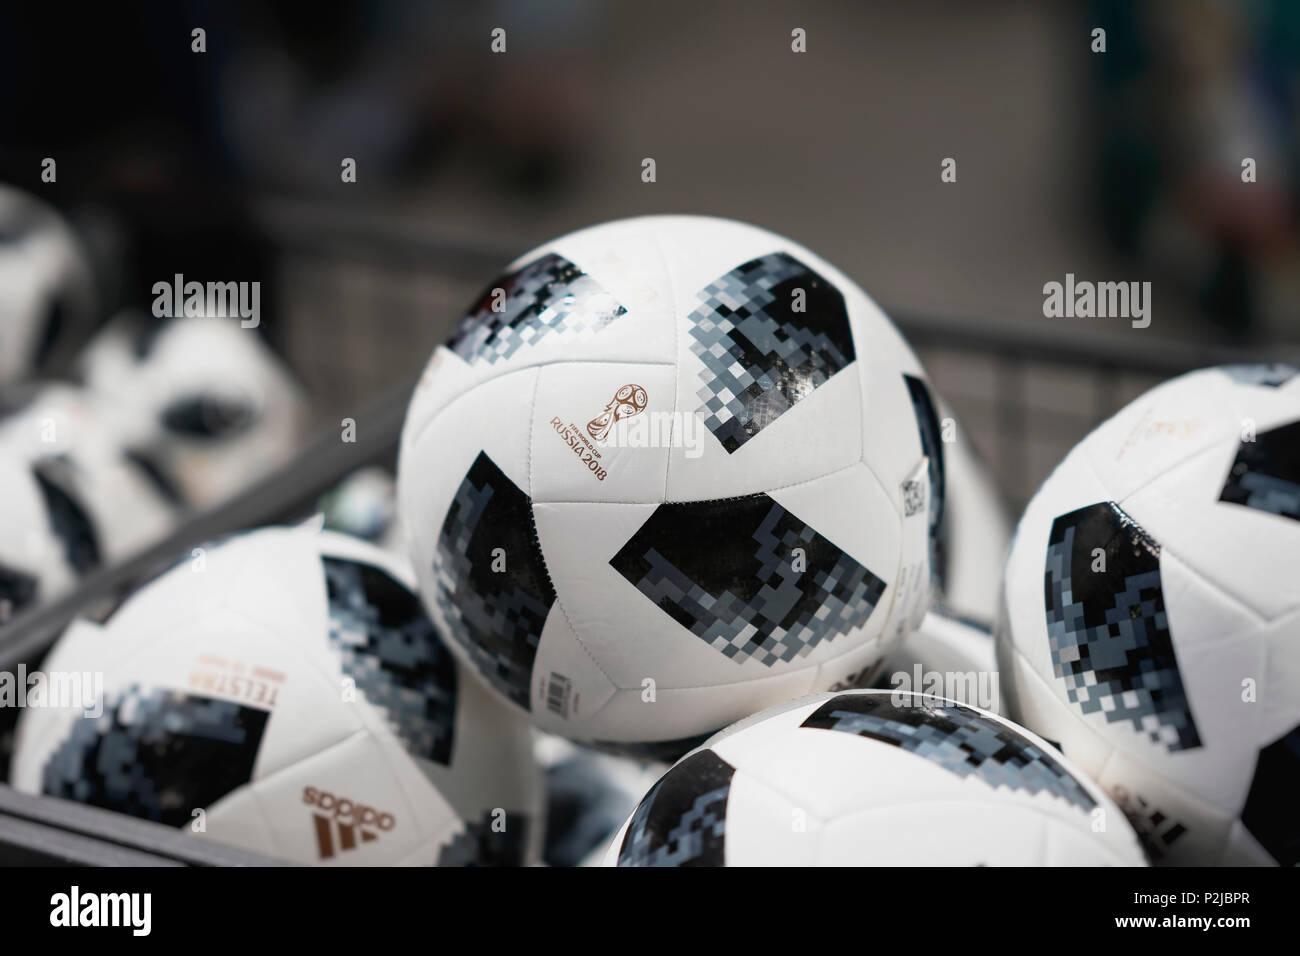 68614ba00 Fifa World Cup 2018 Adidas Telstar Football Stock Photos & Fifa ...